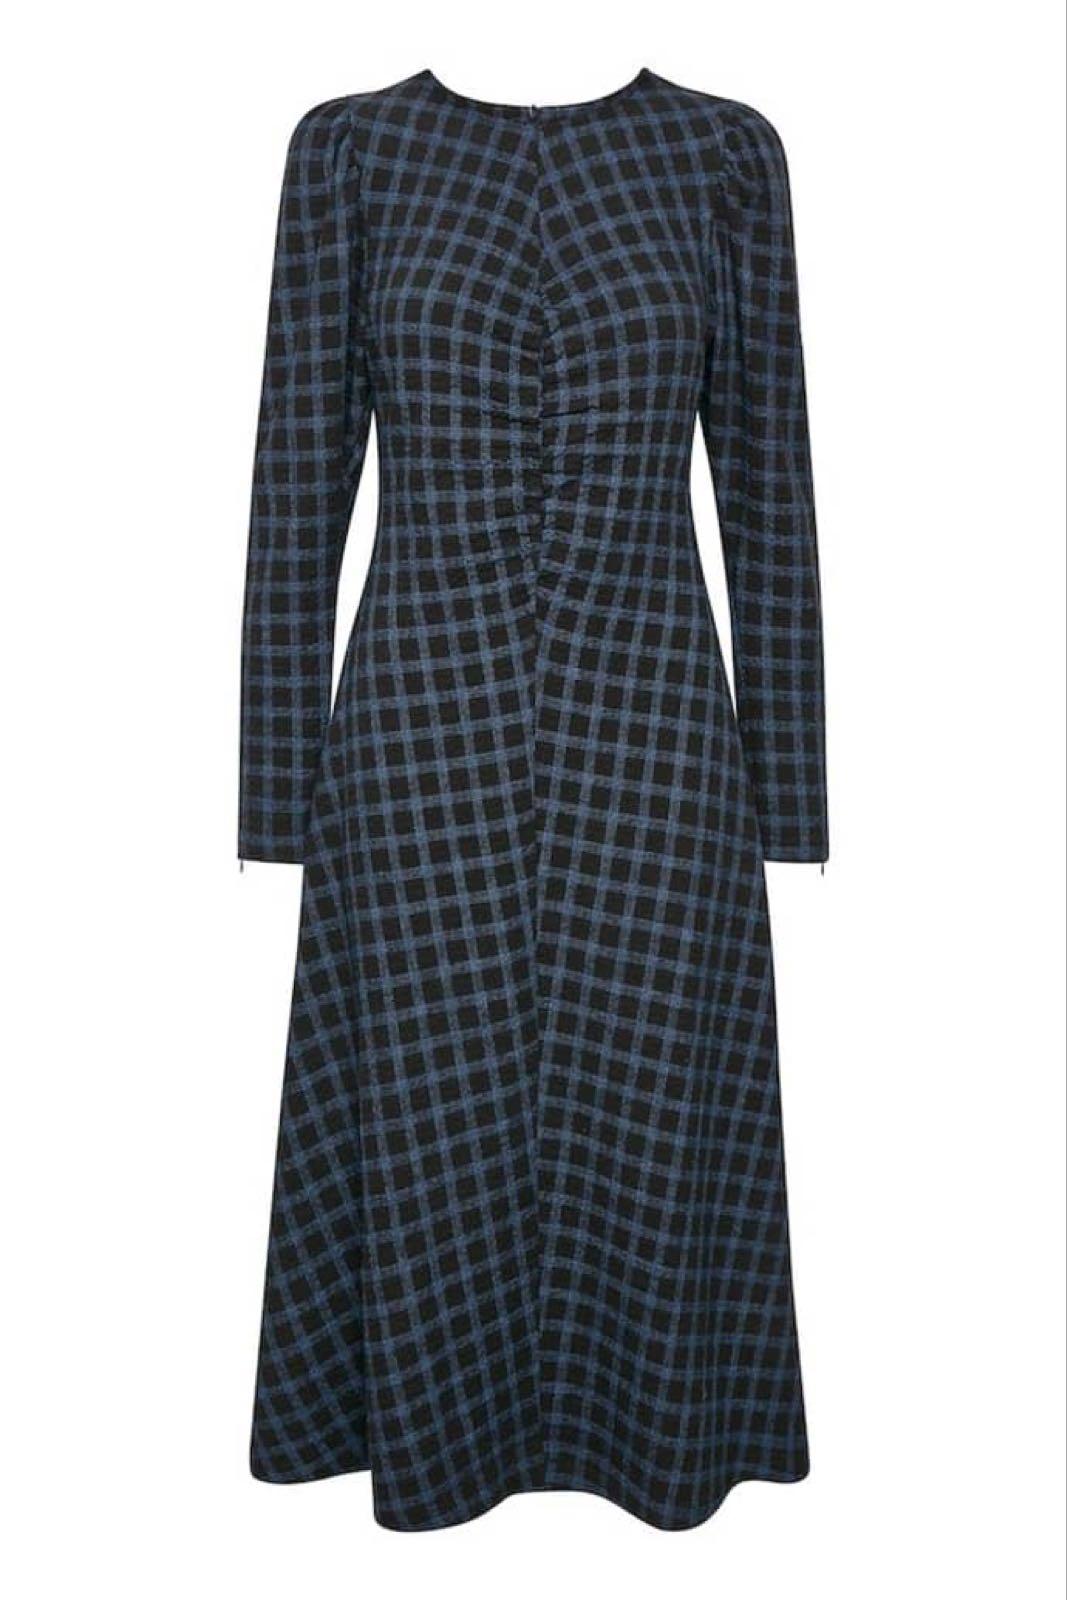 GESTUZ - Lydia kjole sort/blåt ternf